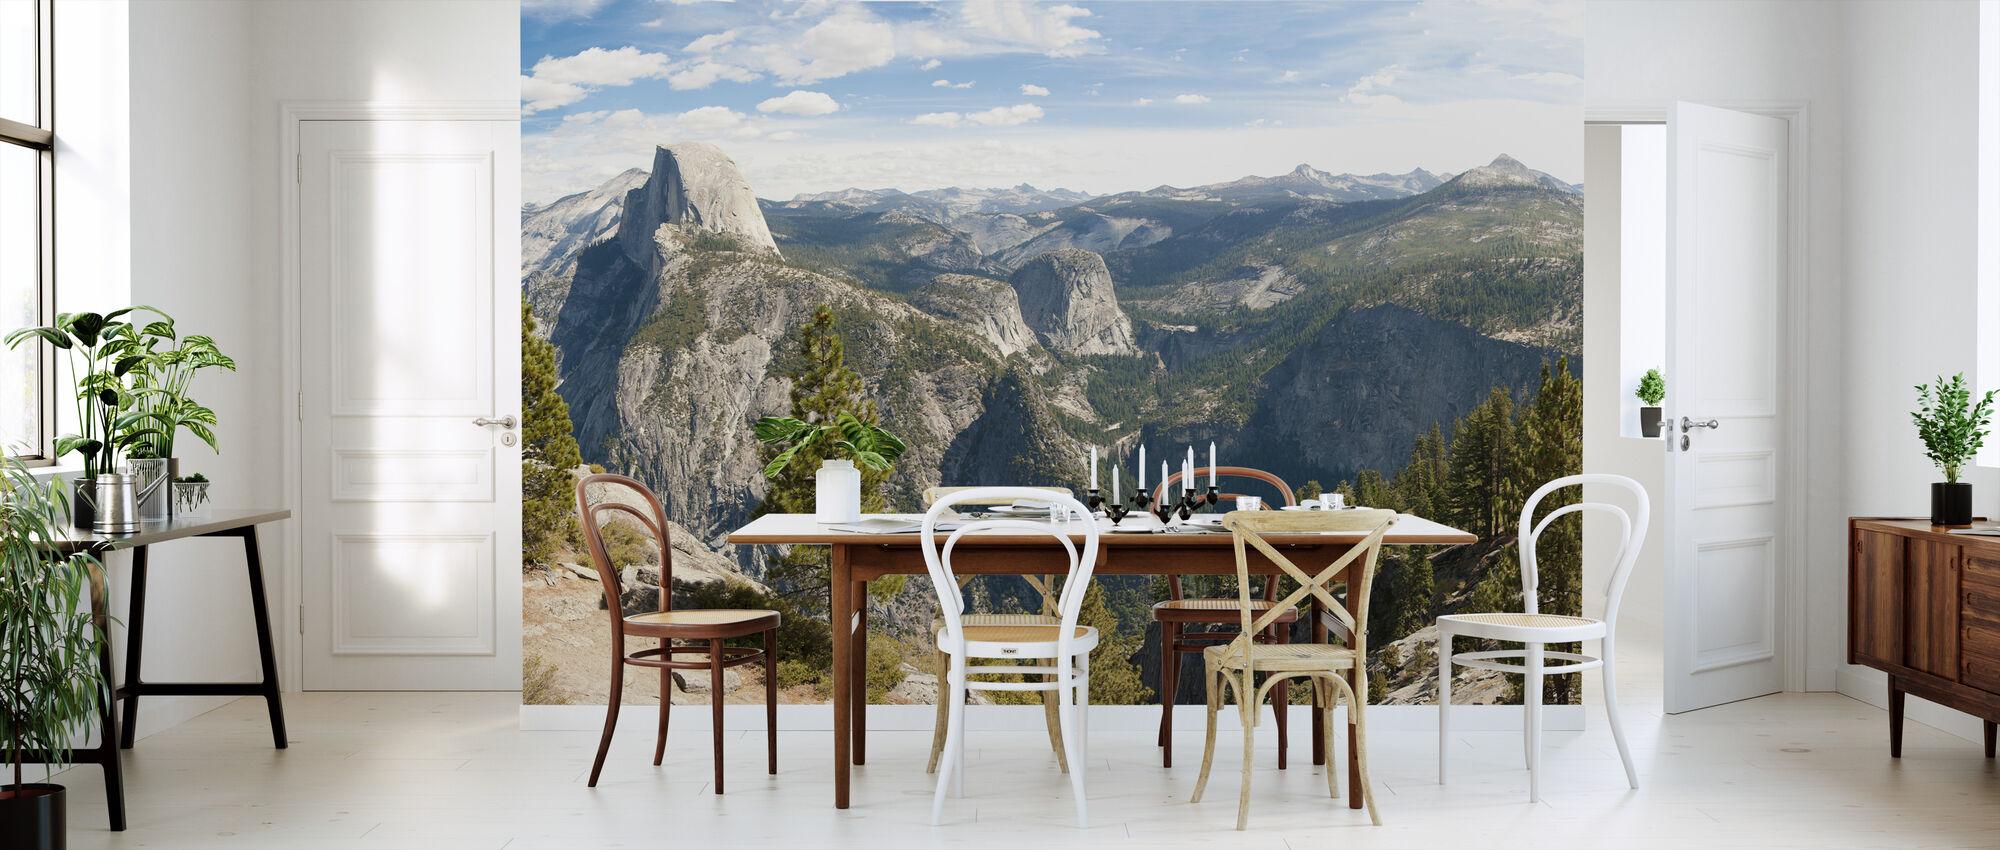 yosemite park california fototapete nach ma photowall. Black Bedroom Furniture Sets. Home Design Ideas